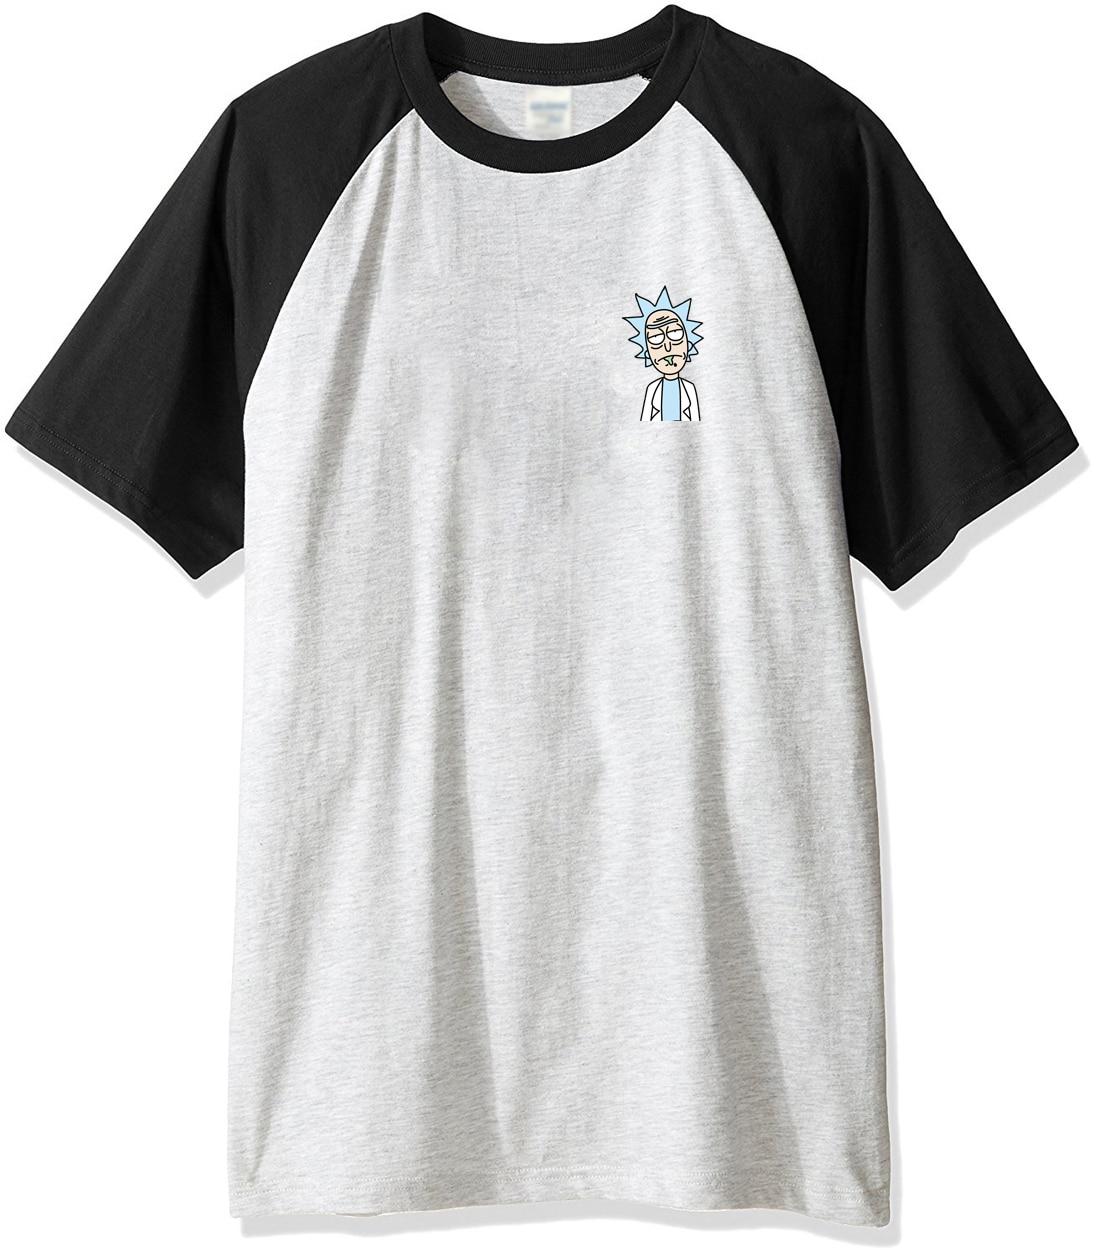 Fashion Men's T-shirts 2019 Spring Summer Raglan Tshirts Men Brand Cotton Casual Tshirt RICK AND MORTY Kpop Streetwear Top Shirt